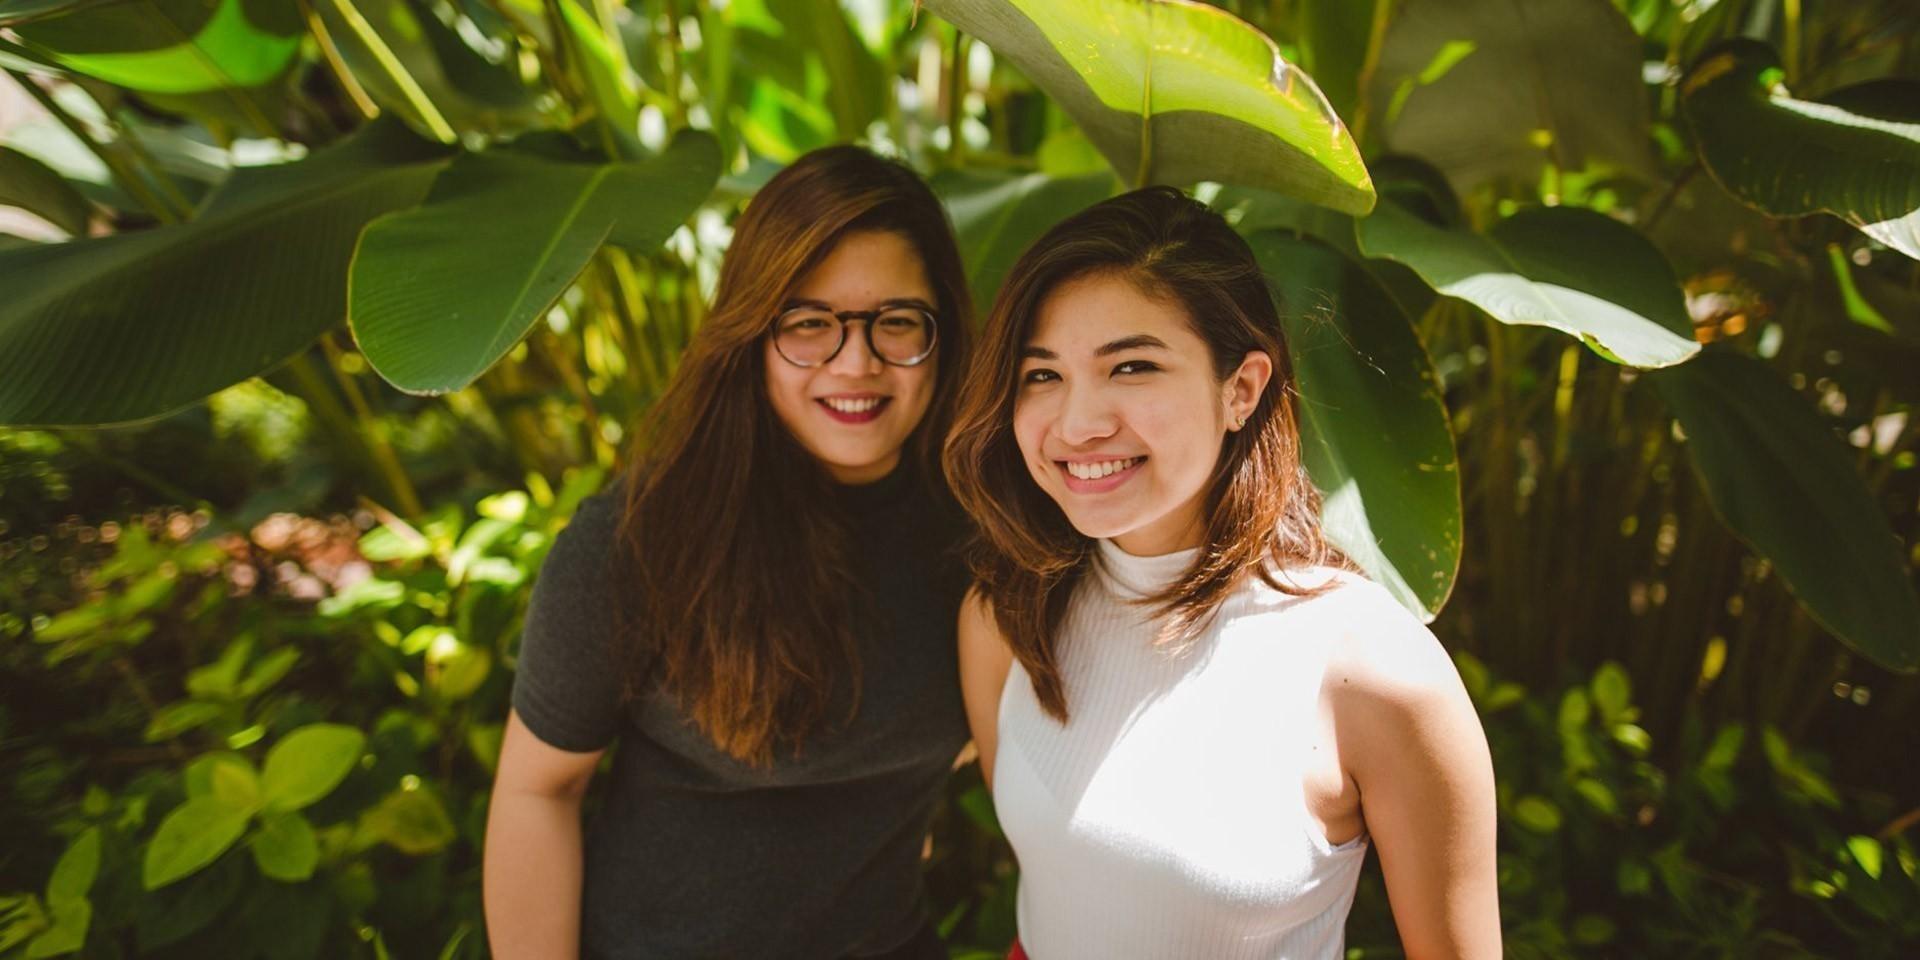 Leanne & Naara share acoustic cover of Nina's 'Someday' – listen